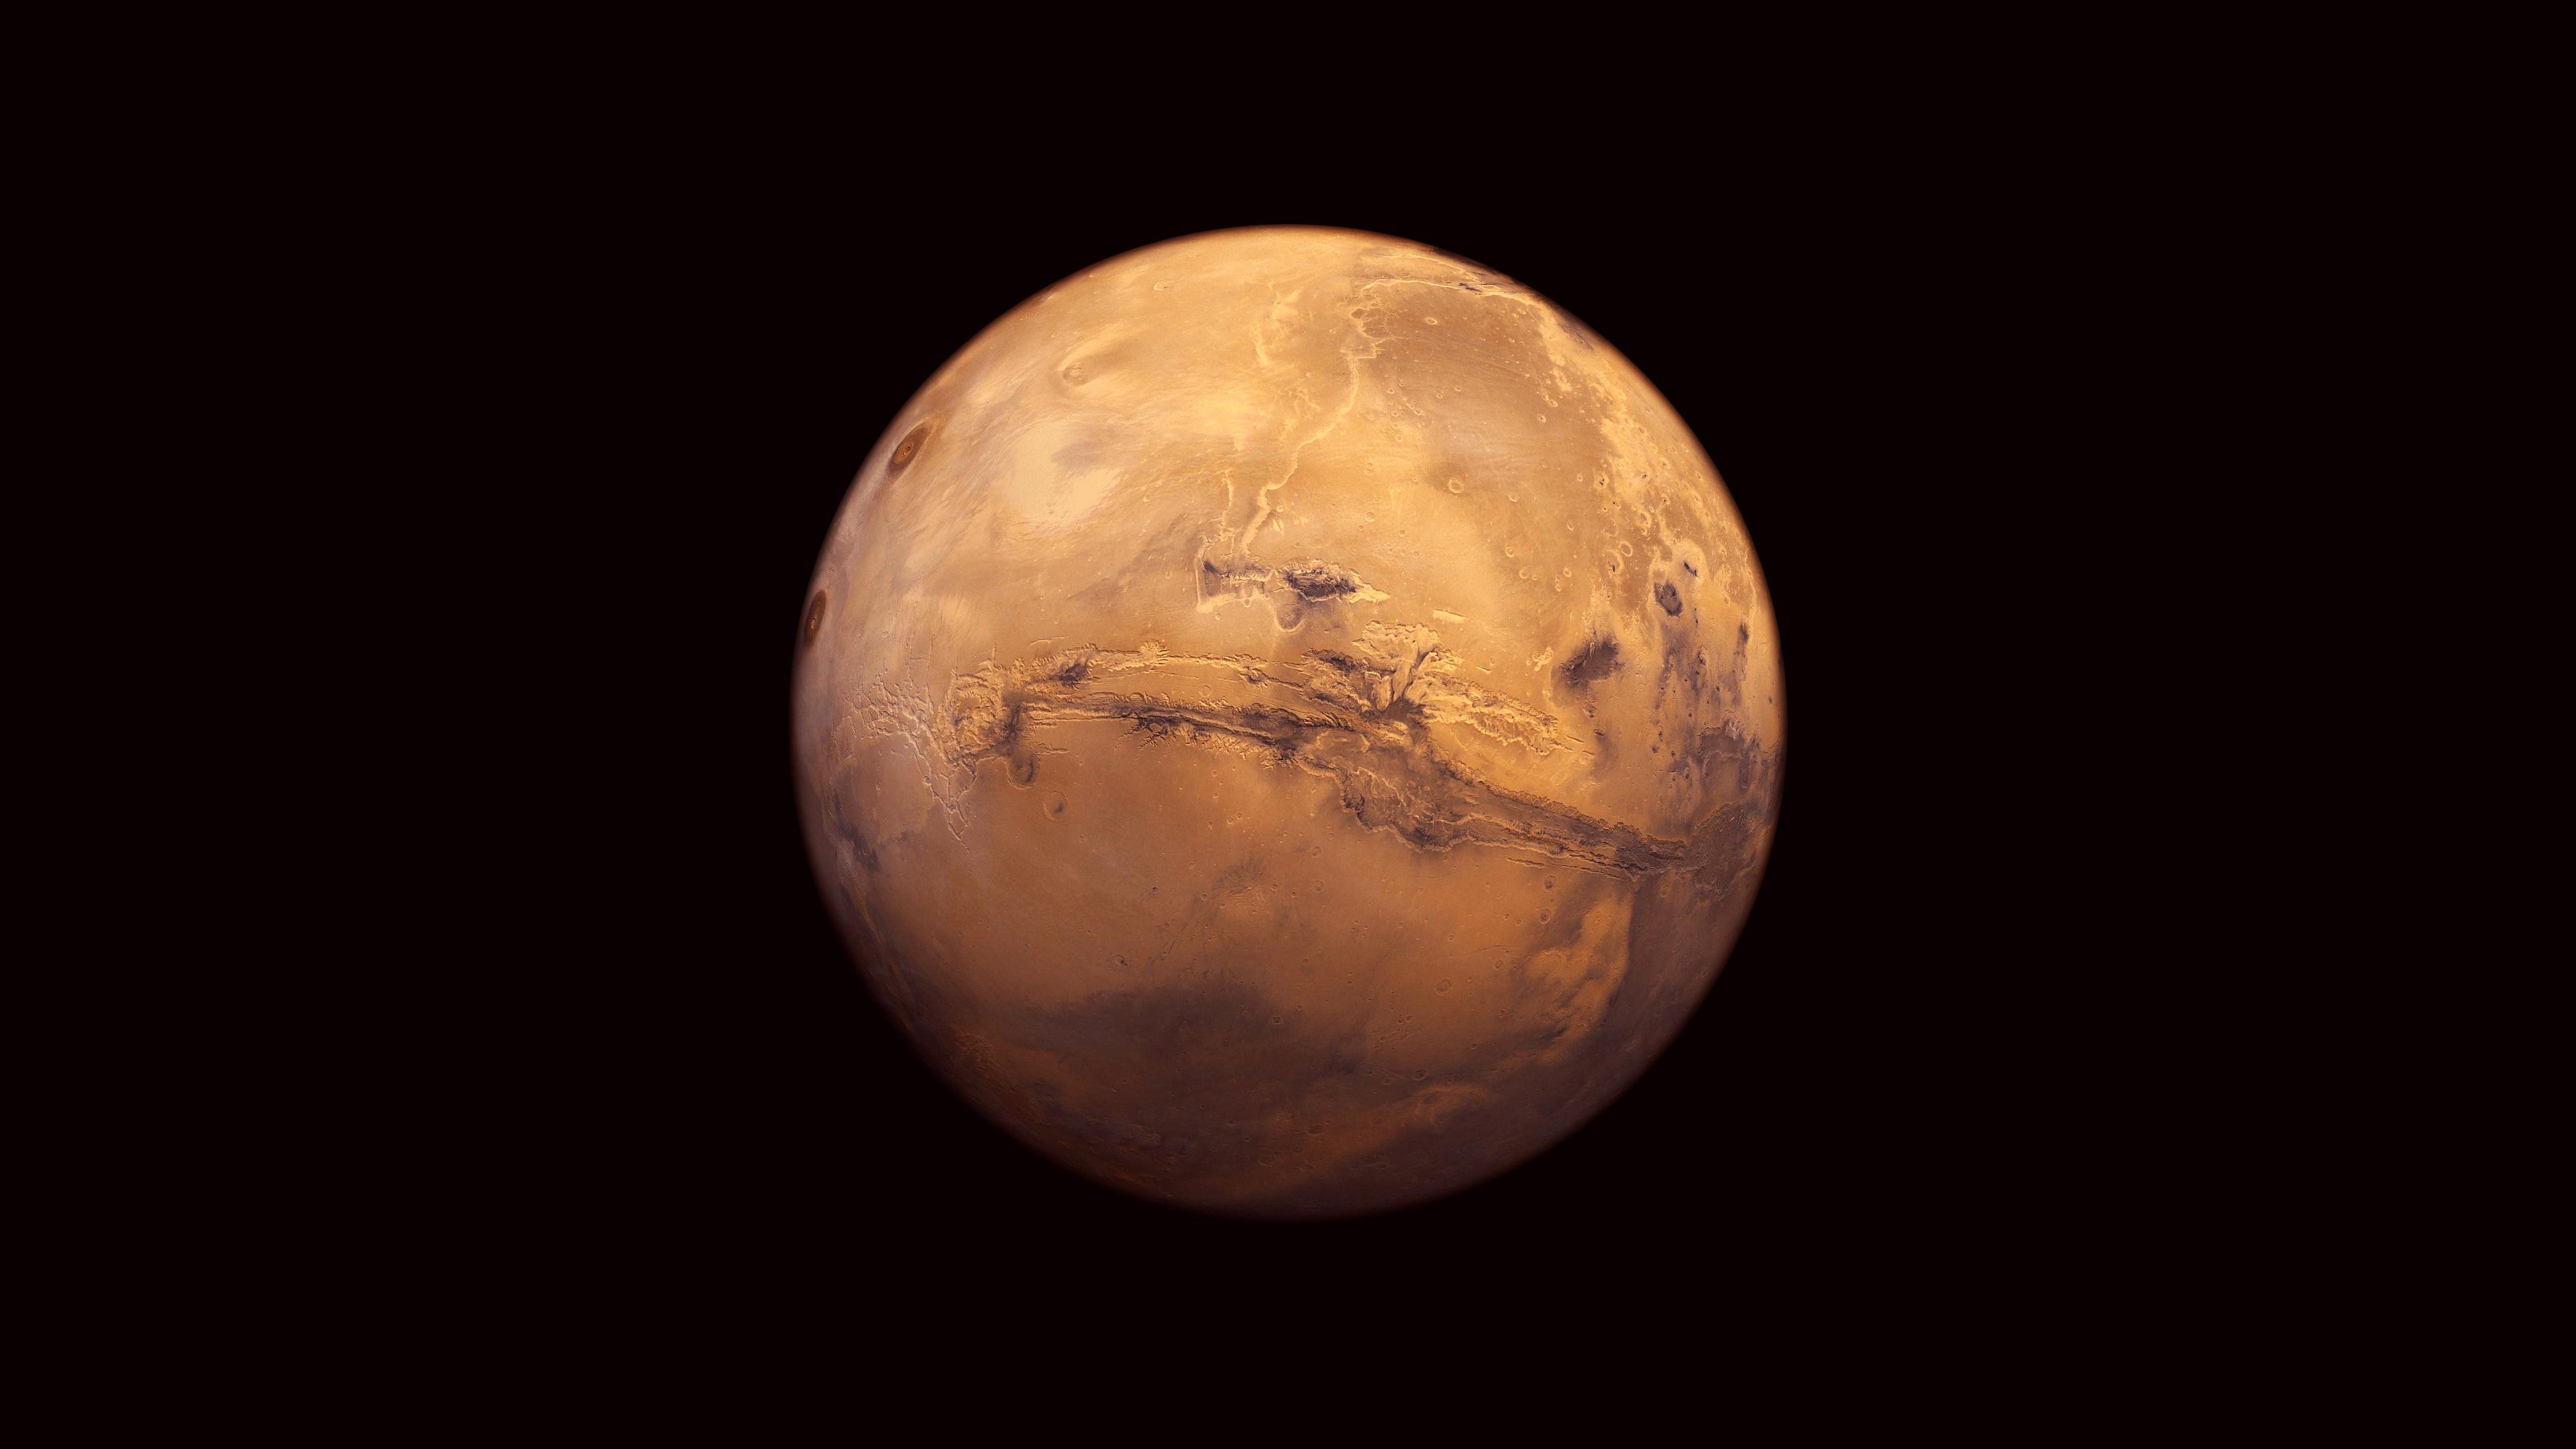 mars-high-resolution-wallpapers-cool-desktop-background-images-